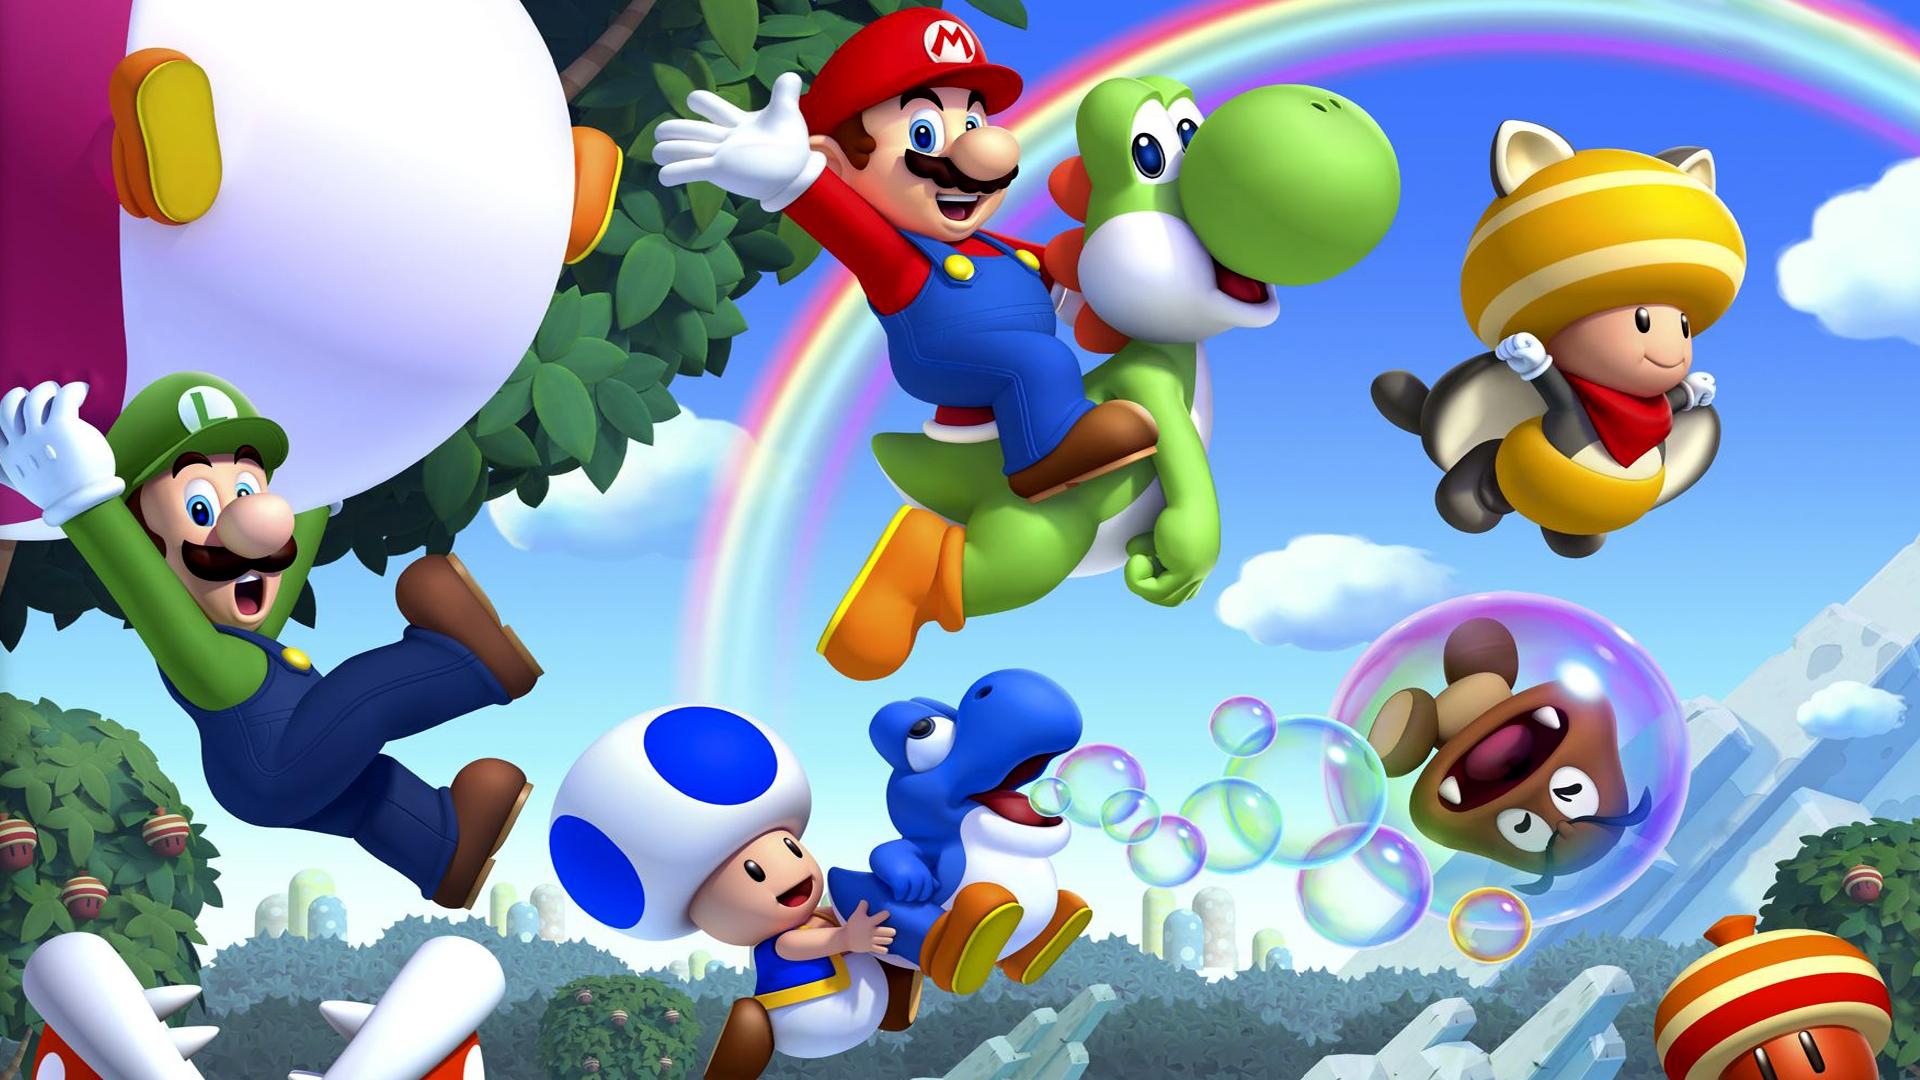 Mario Desktop Backgrounds: Super Mario Wallpaper 1920x1080